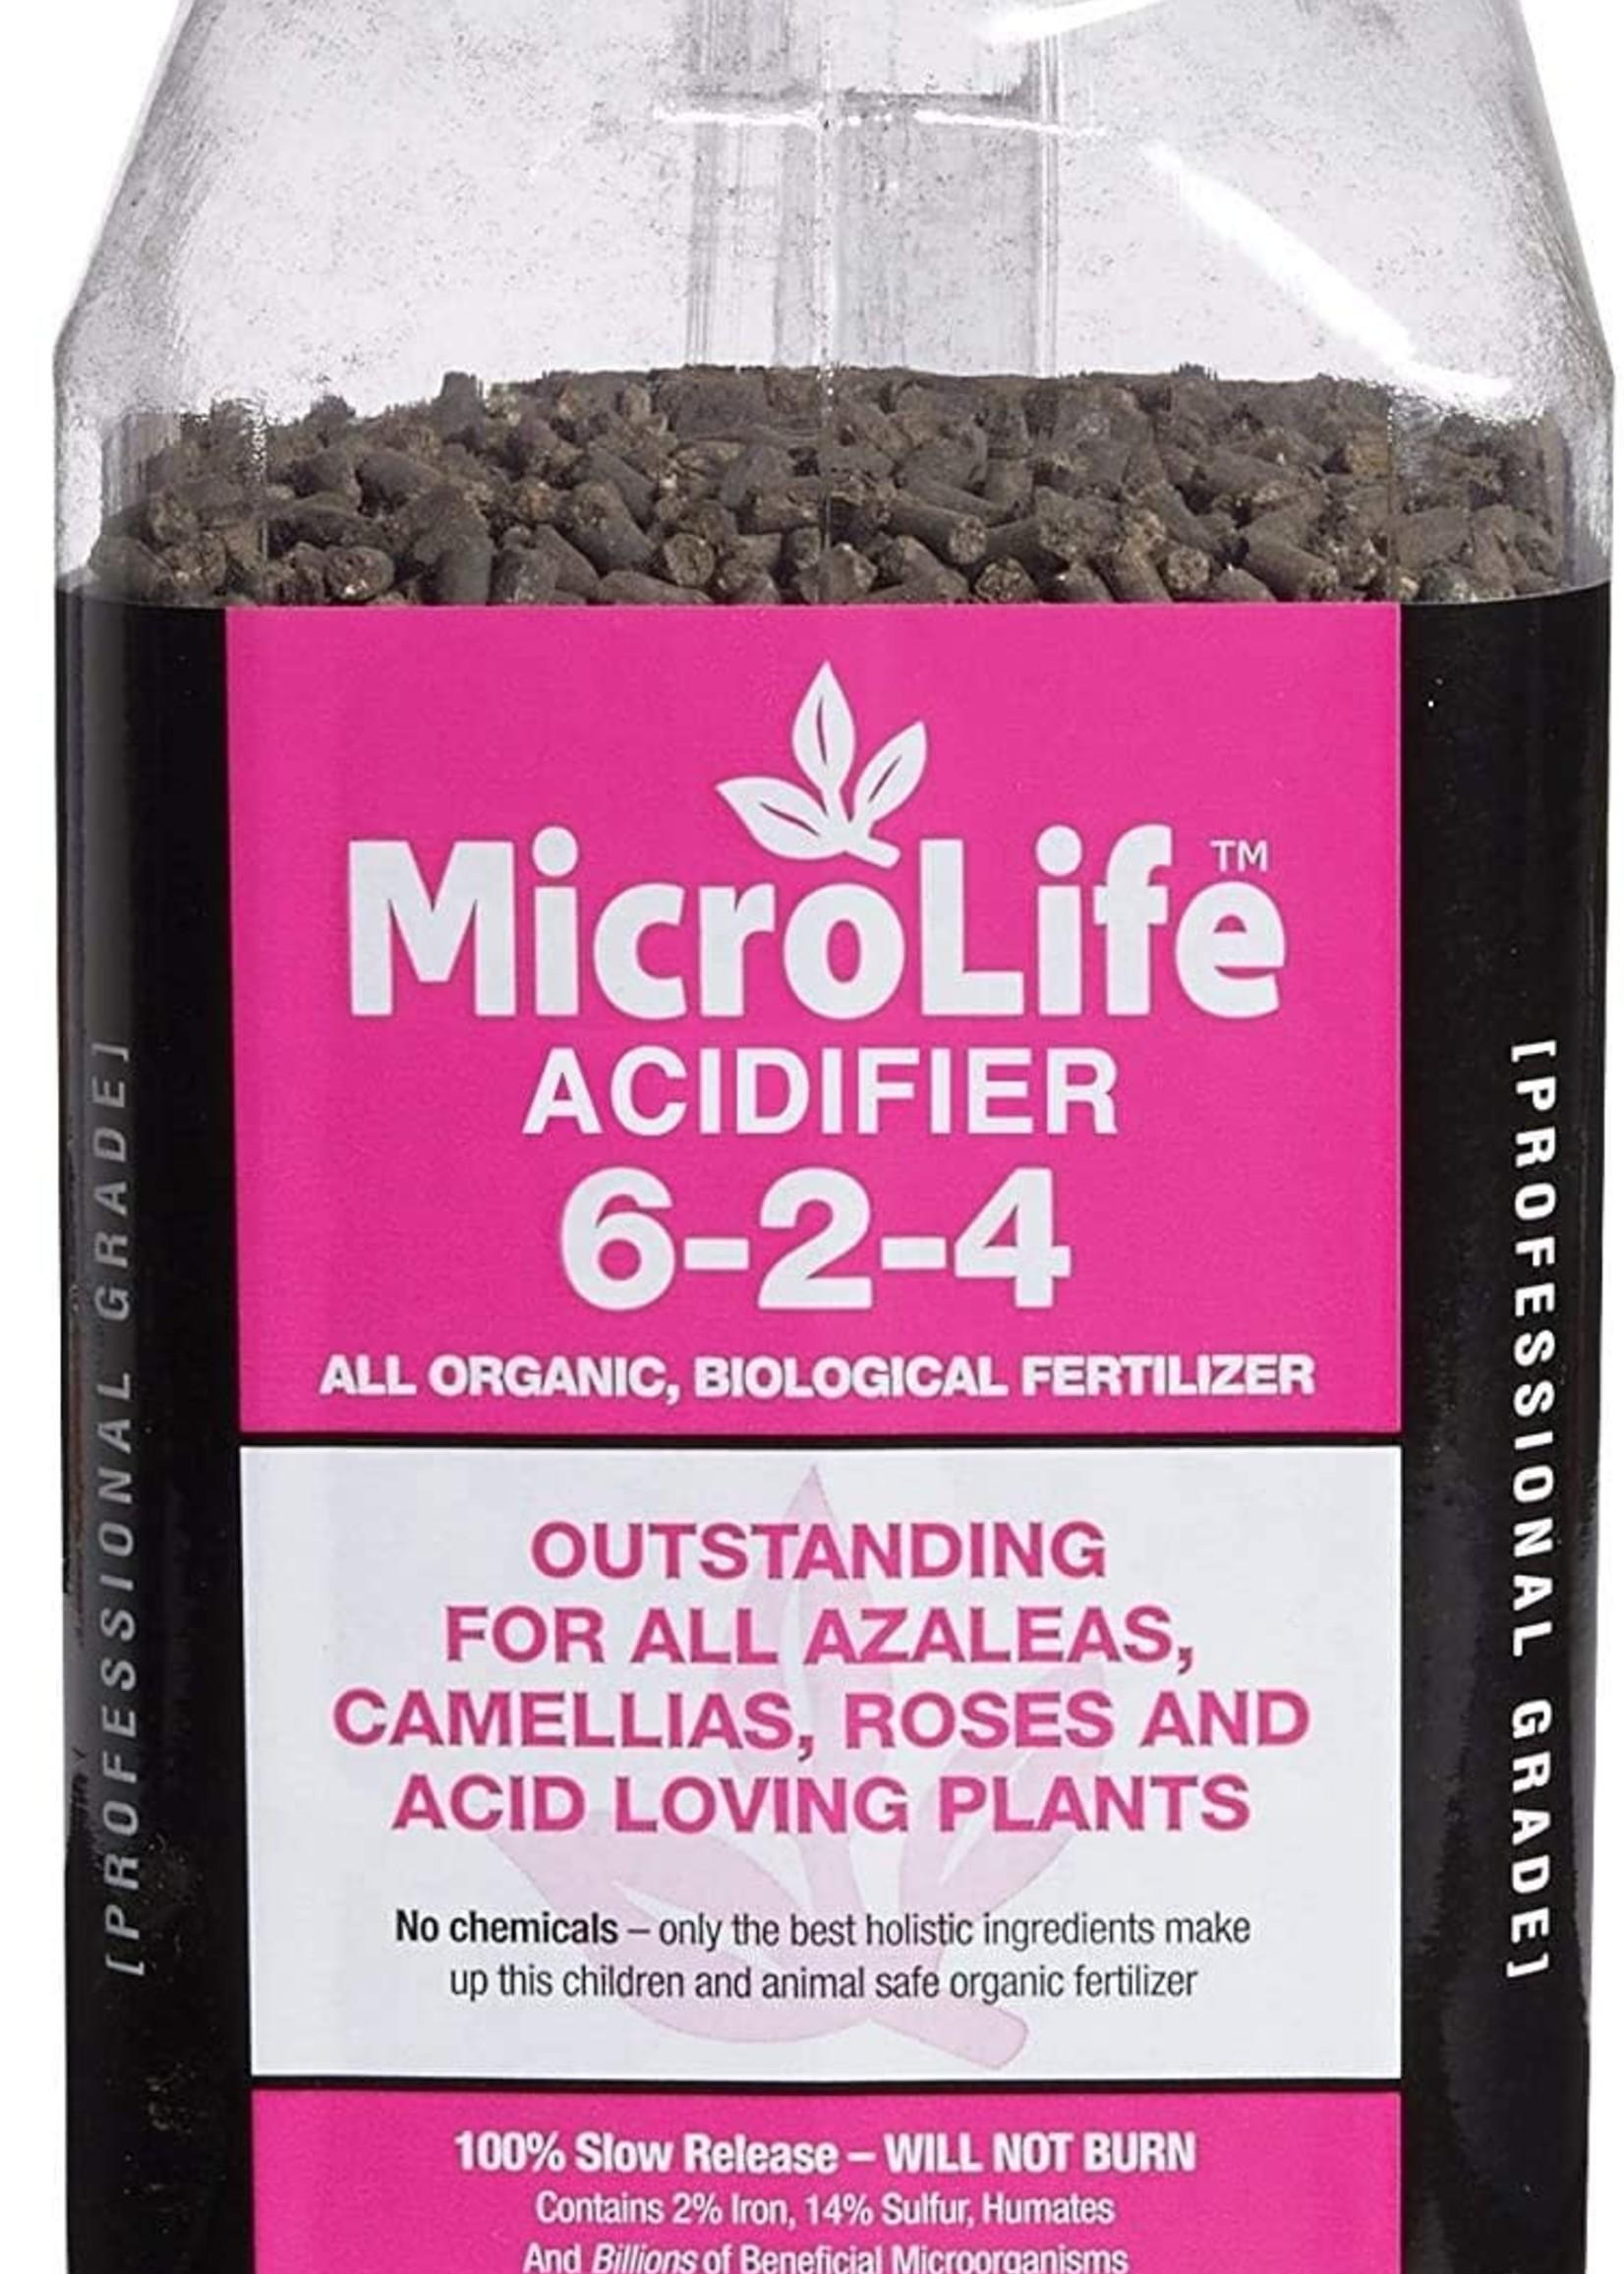 Microlife Azalea Fertilizer 6-2-4 7 lb. jug